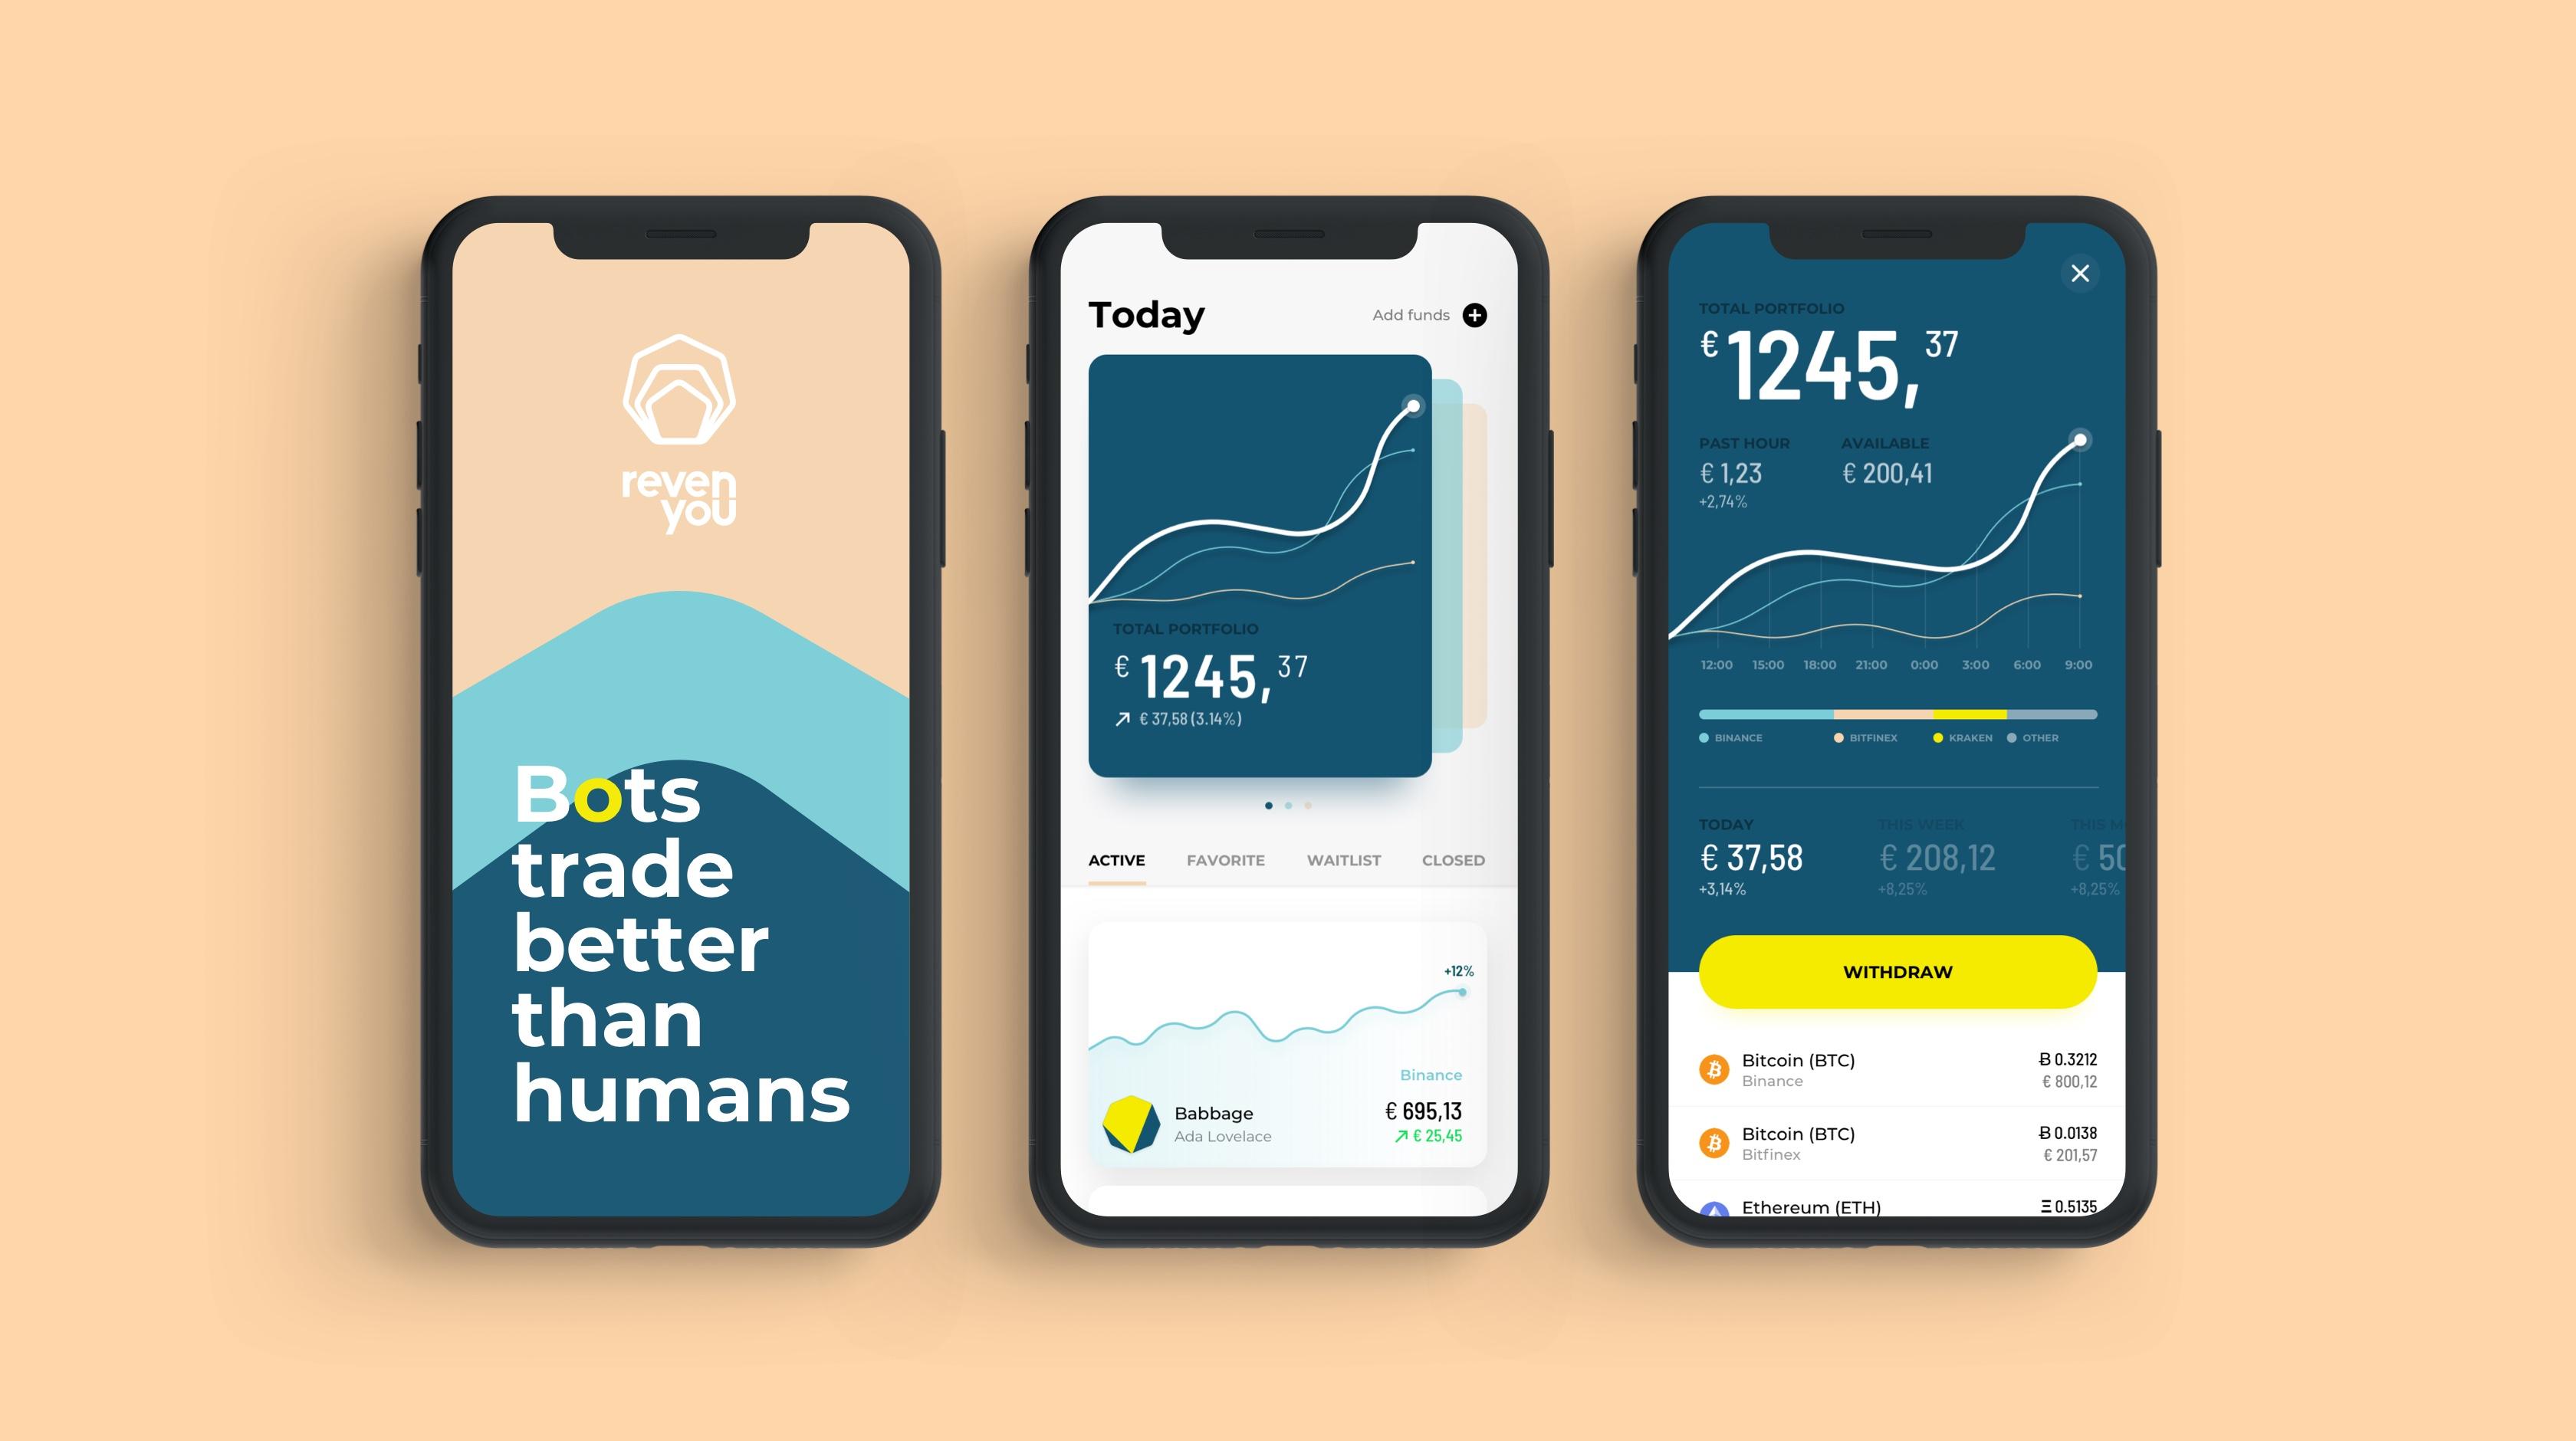 Bots trade better than humans